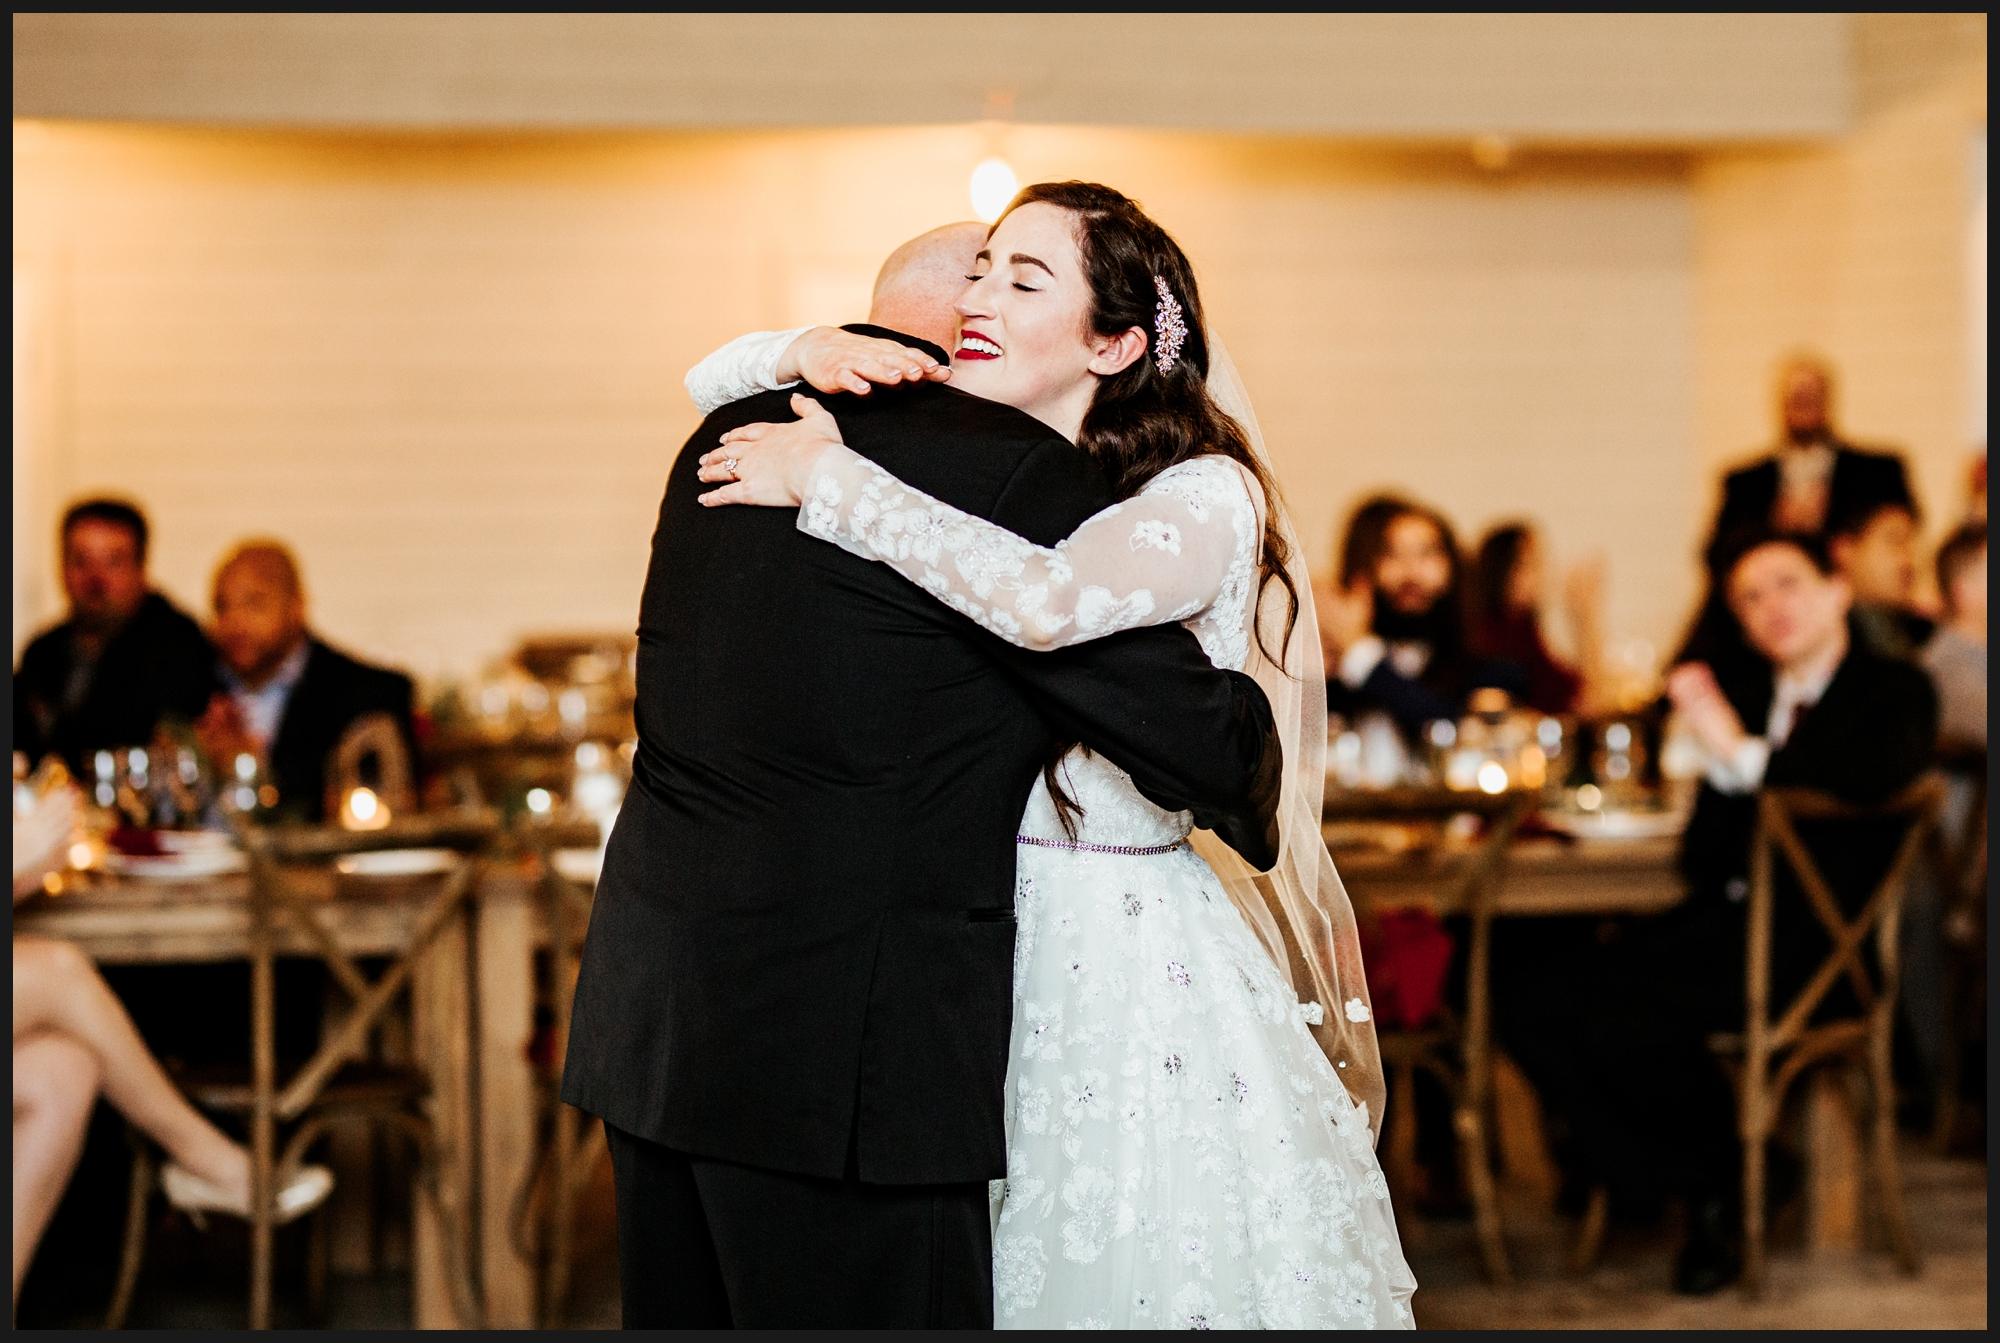 Orlando-Wedding-Photographer-destination-wedding-photographer-florida-wedding-photographer-hawaii-wedding-photographer_0543.jpg